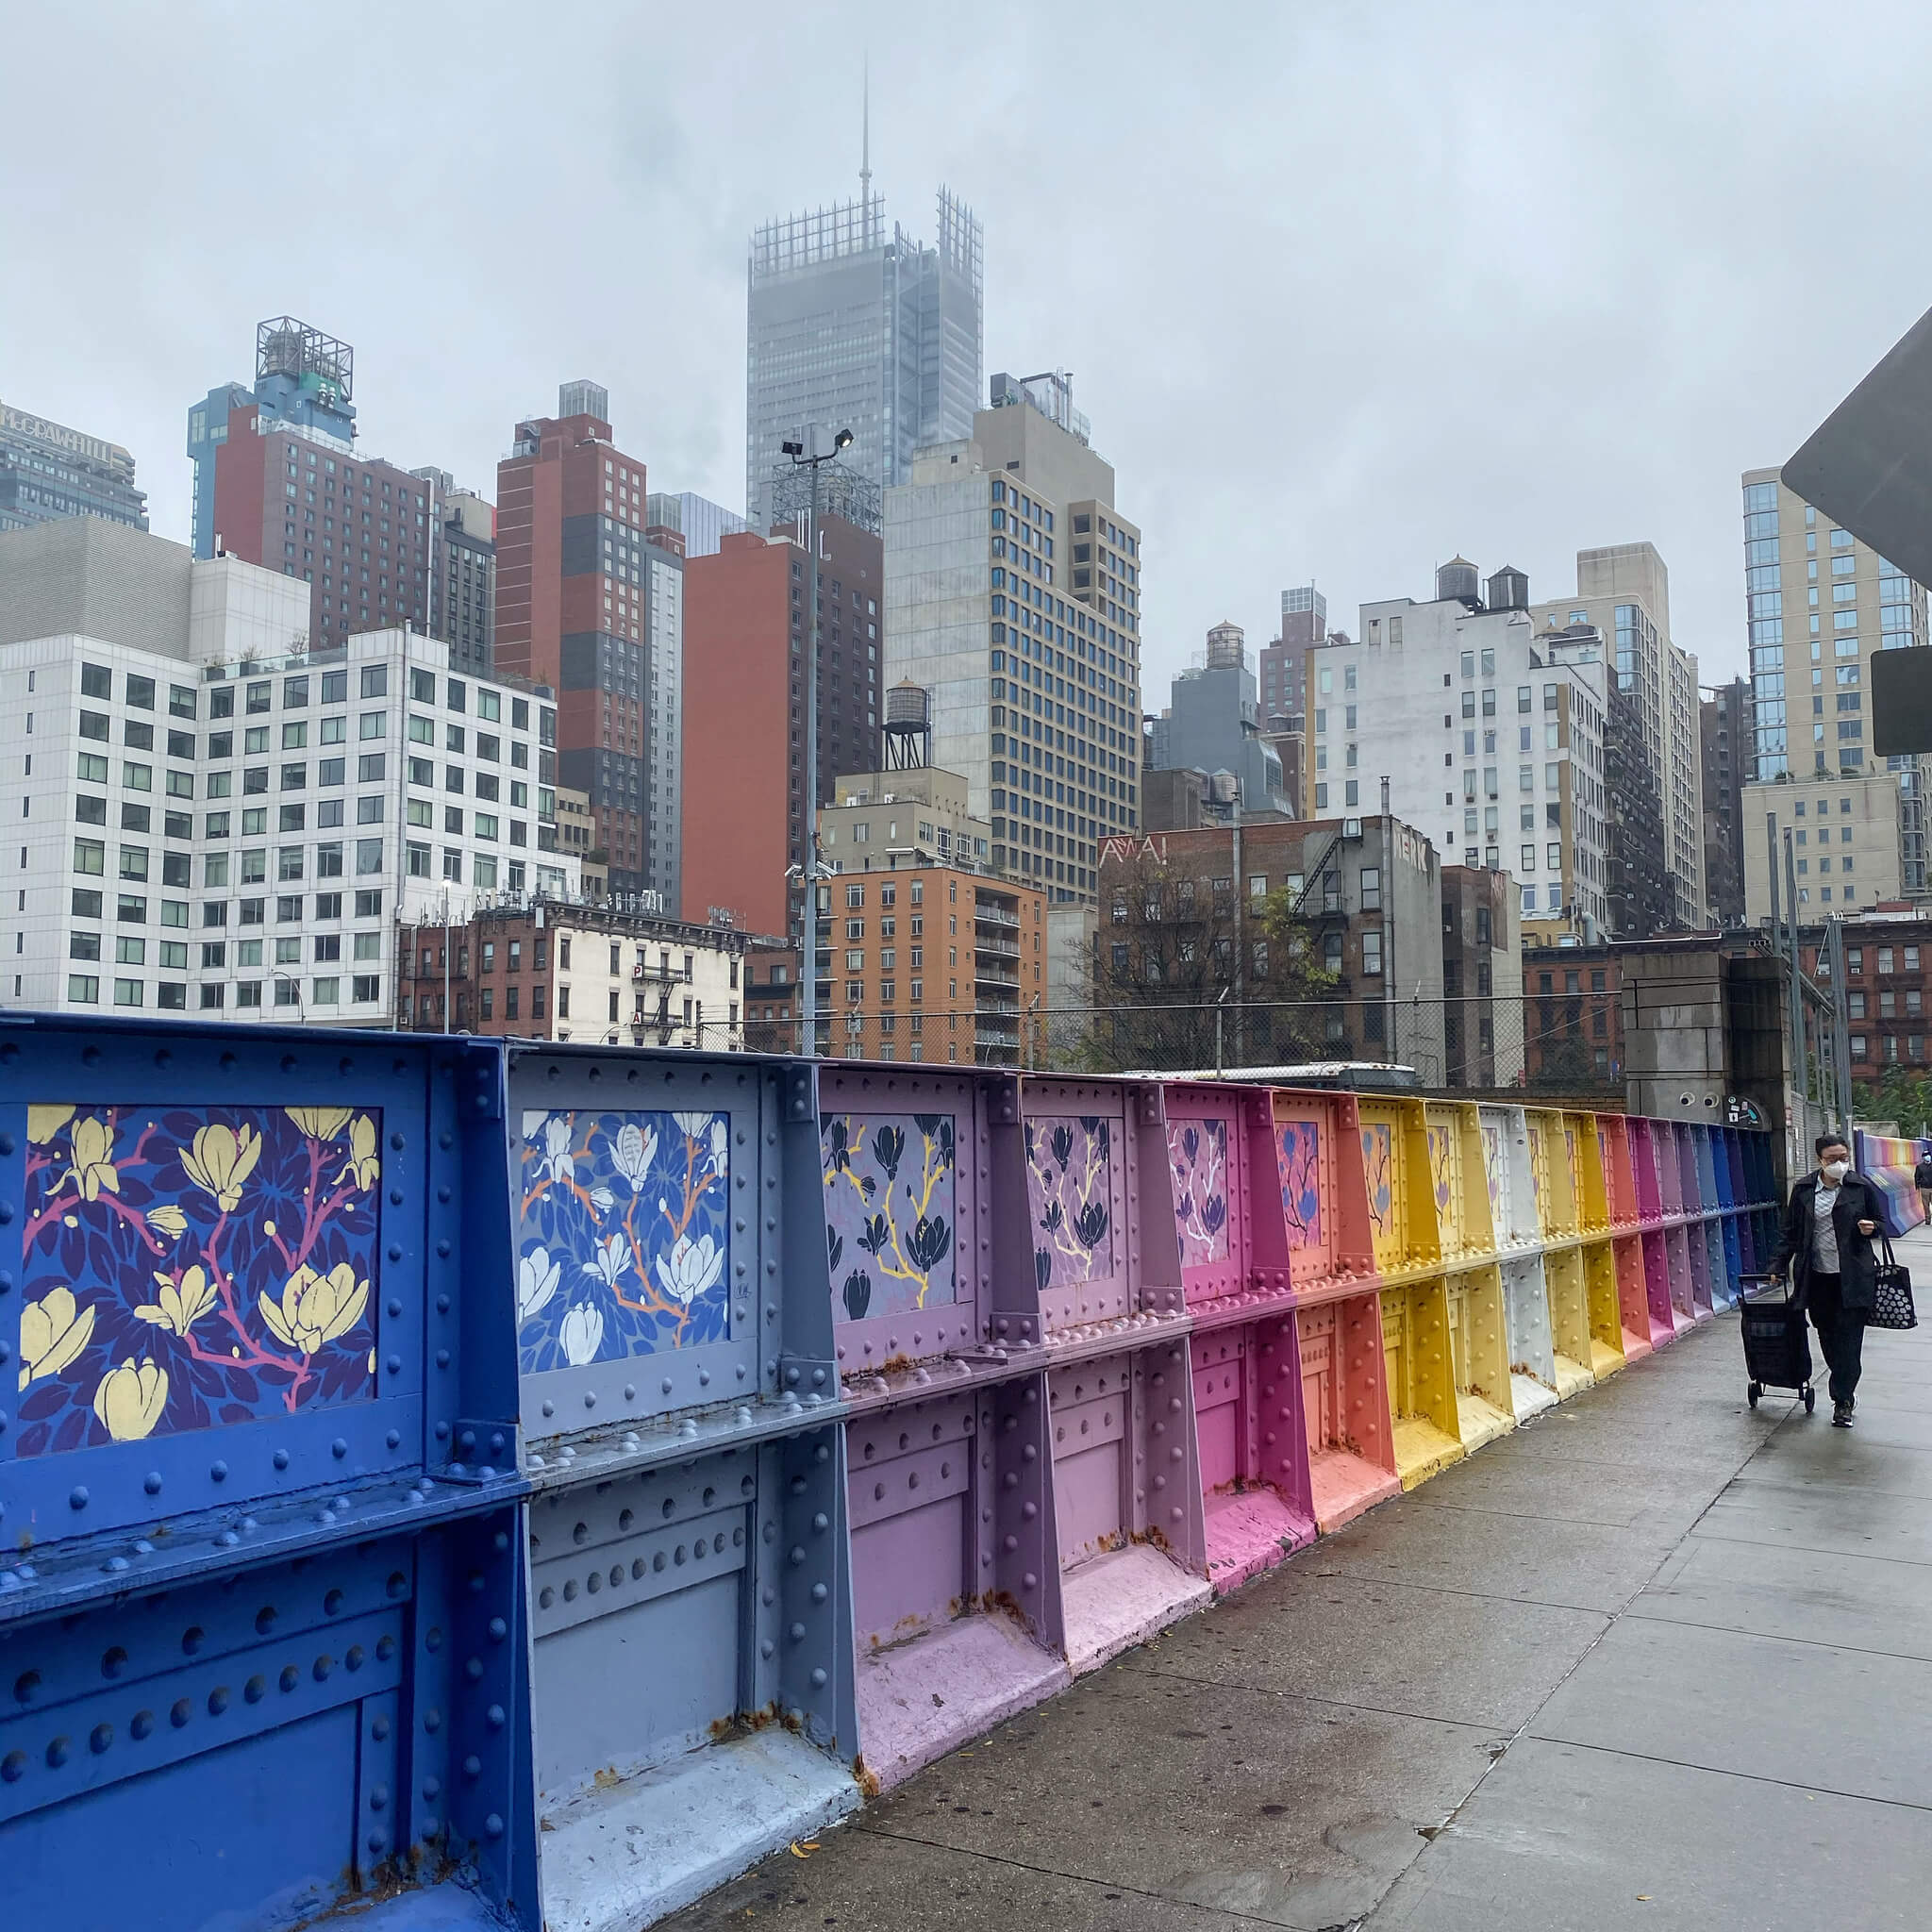 Colourful Street Art Photography by Sarah Sansom